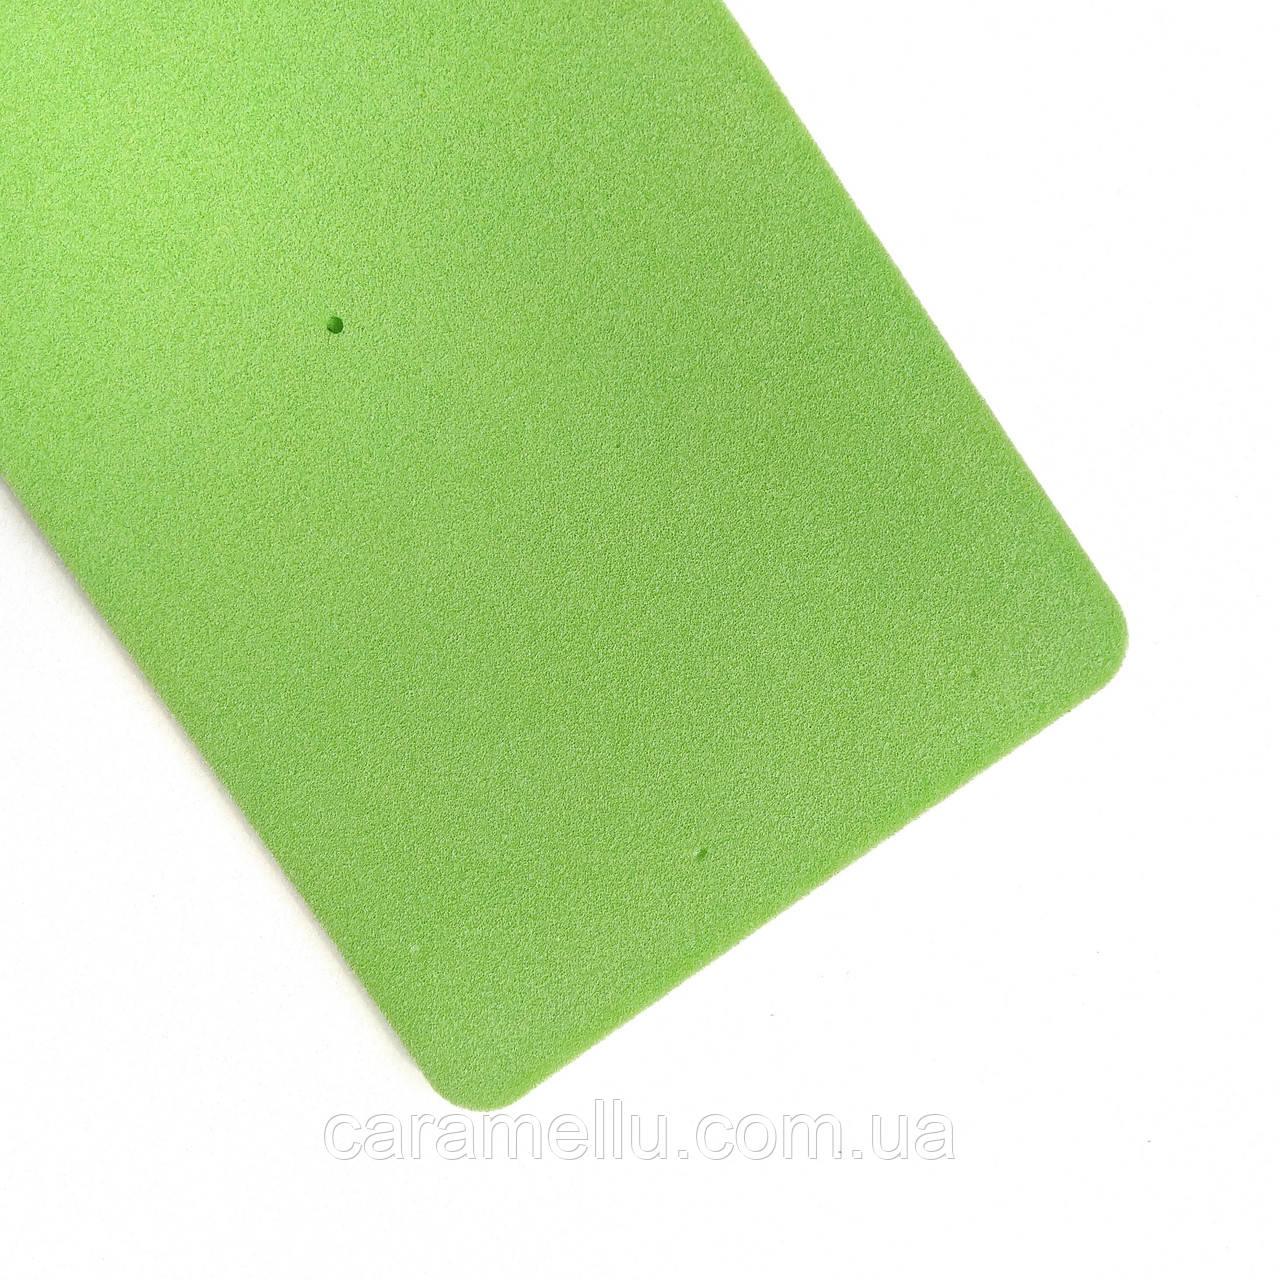 Фоамиран турецкий 2мм. Цвет Светло-зеленый. 50х25см.